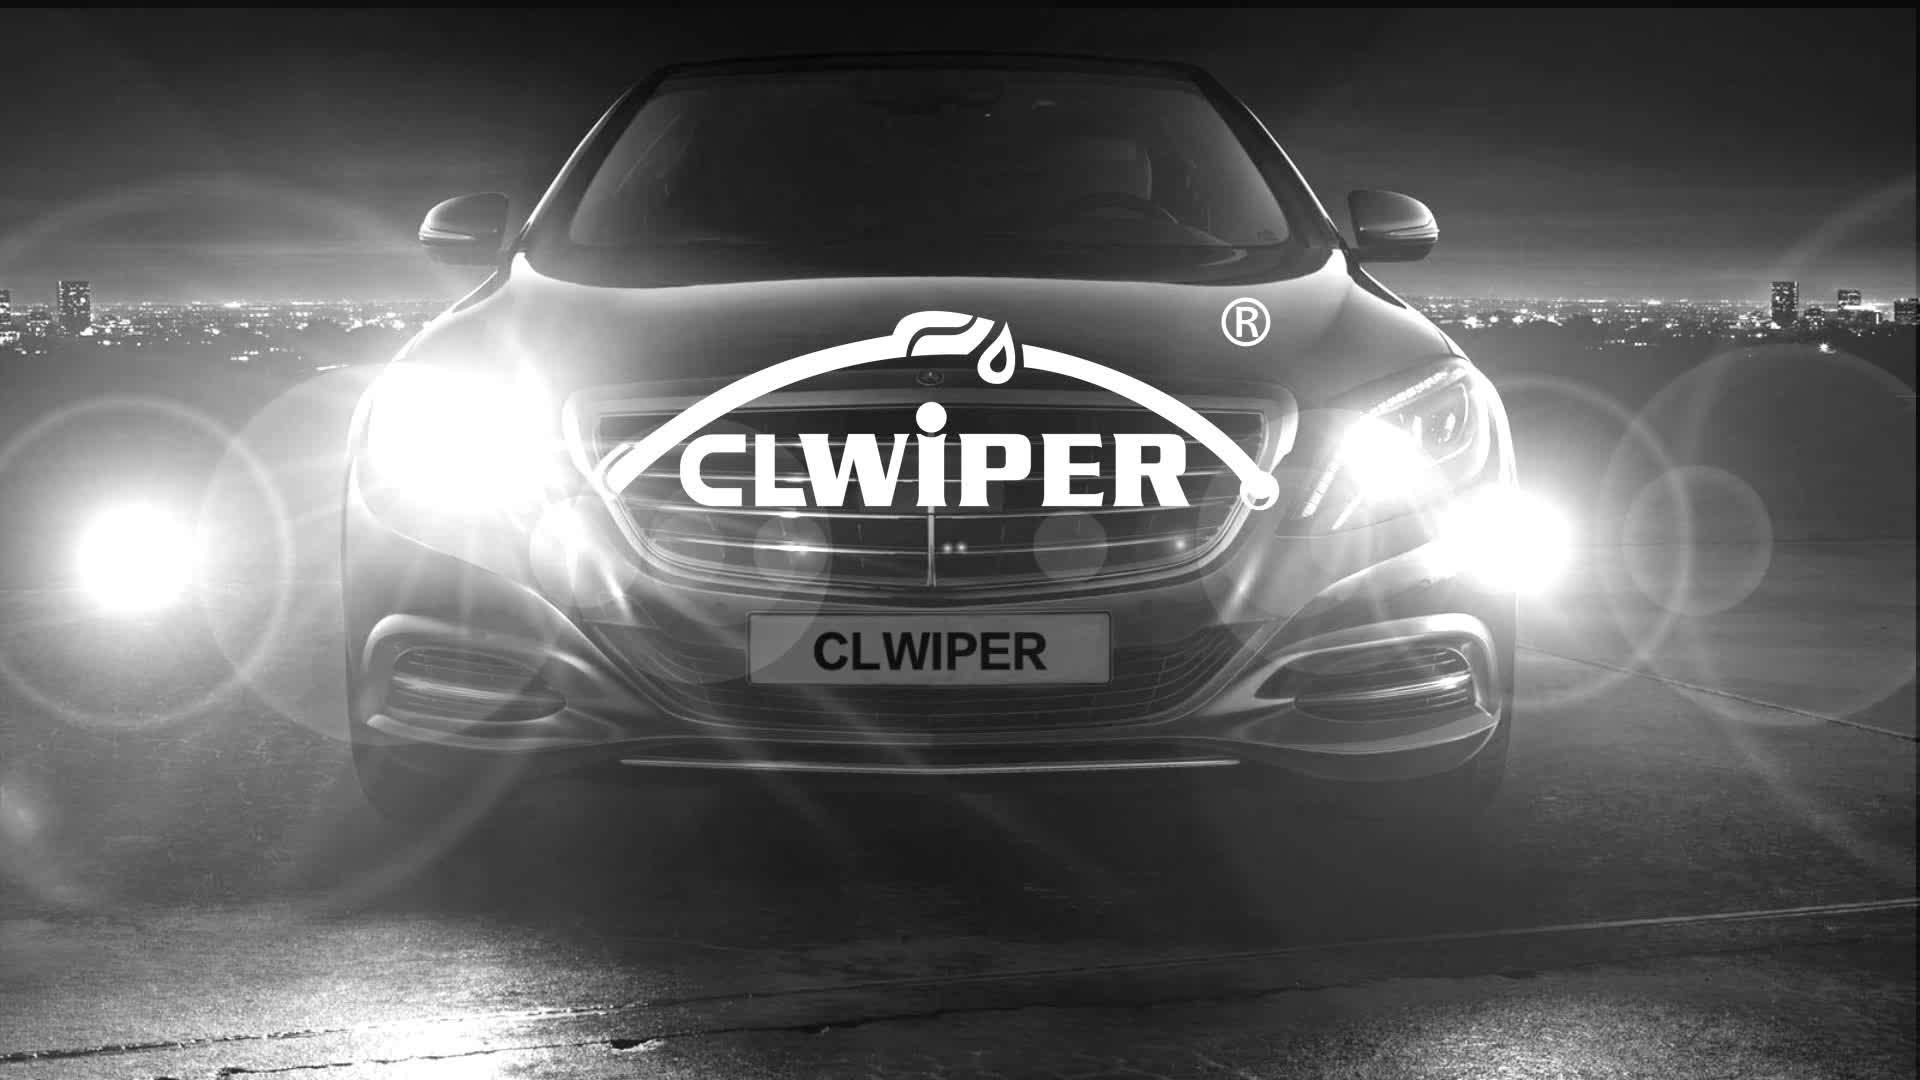 CLWIPER wiper blade material multifunctional wiper blade 5 in 1